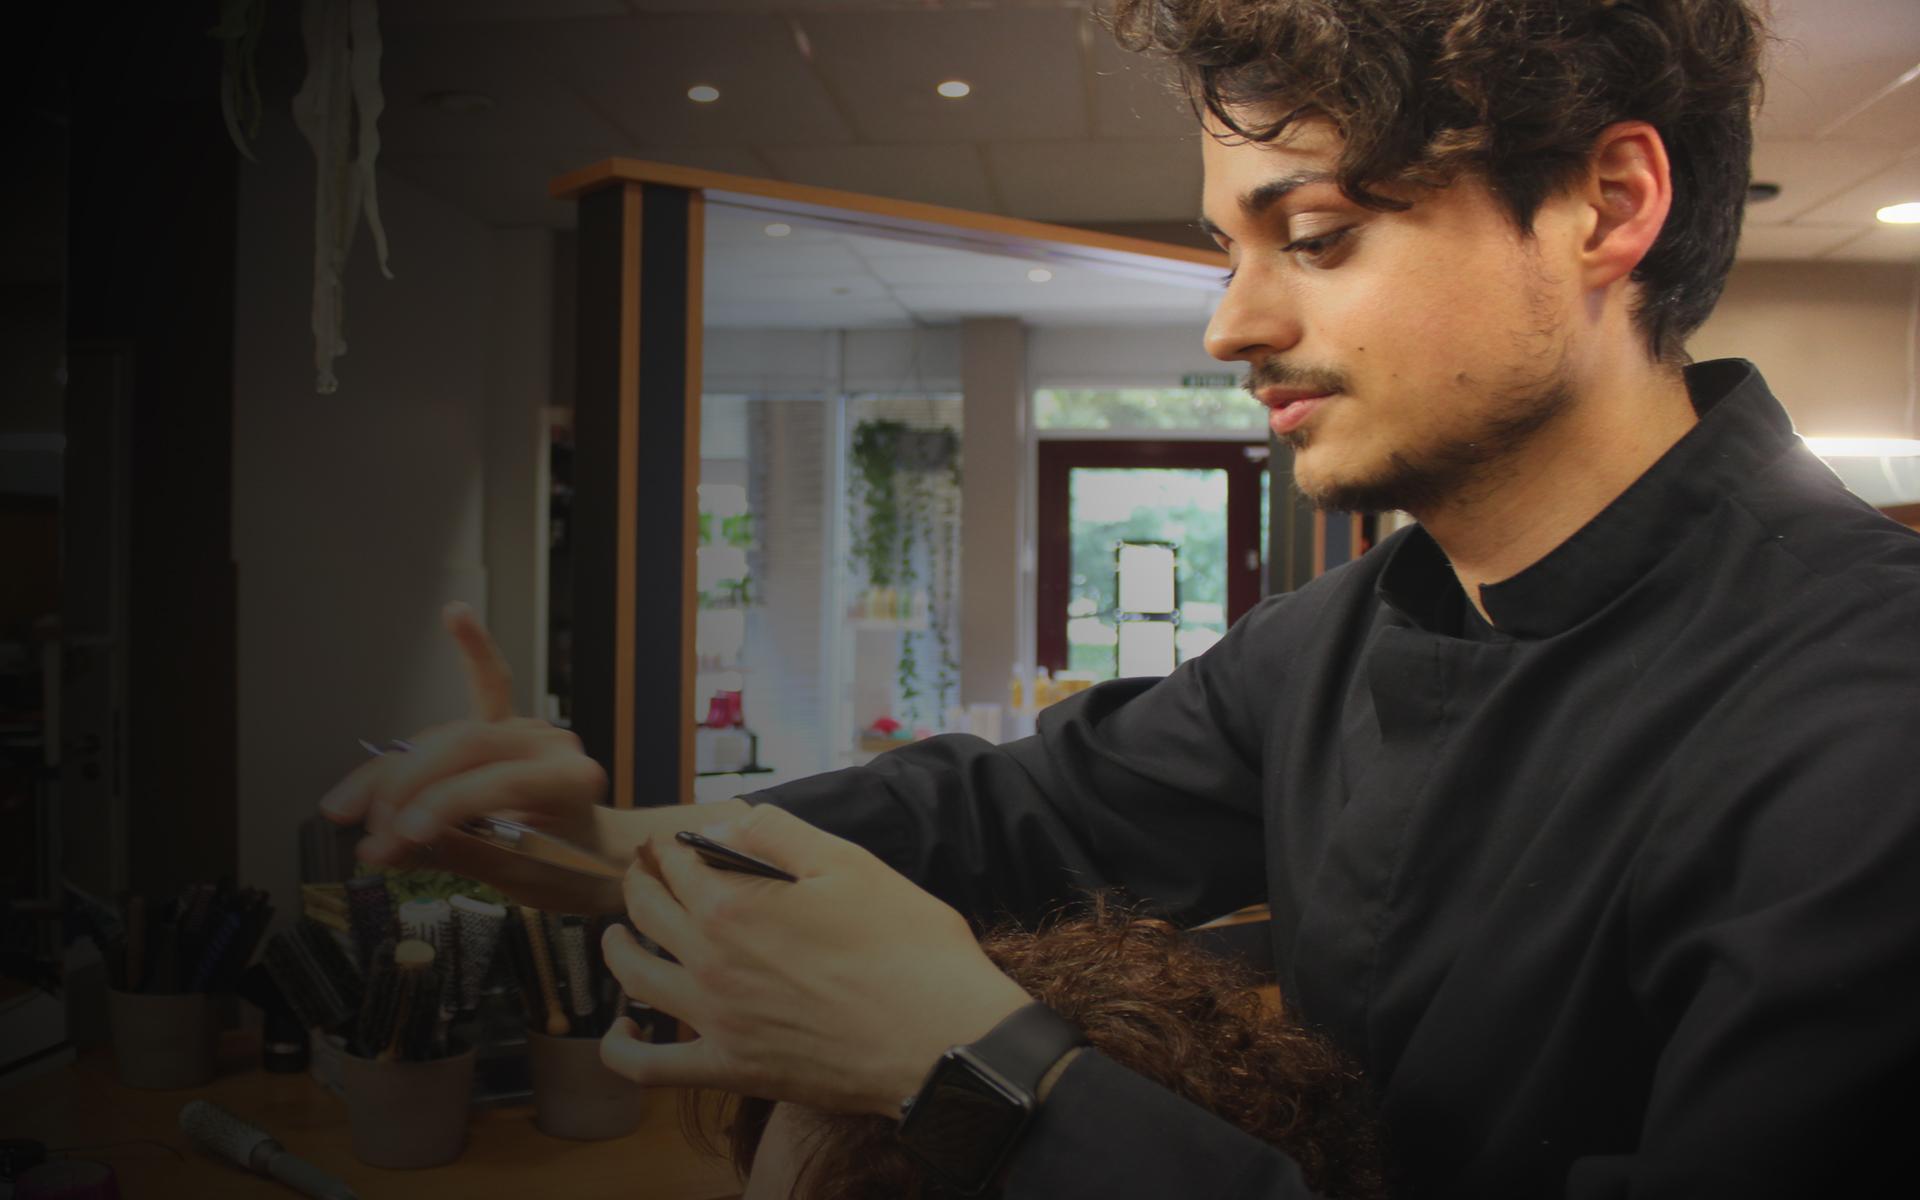 salon de coiffure strasbourg